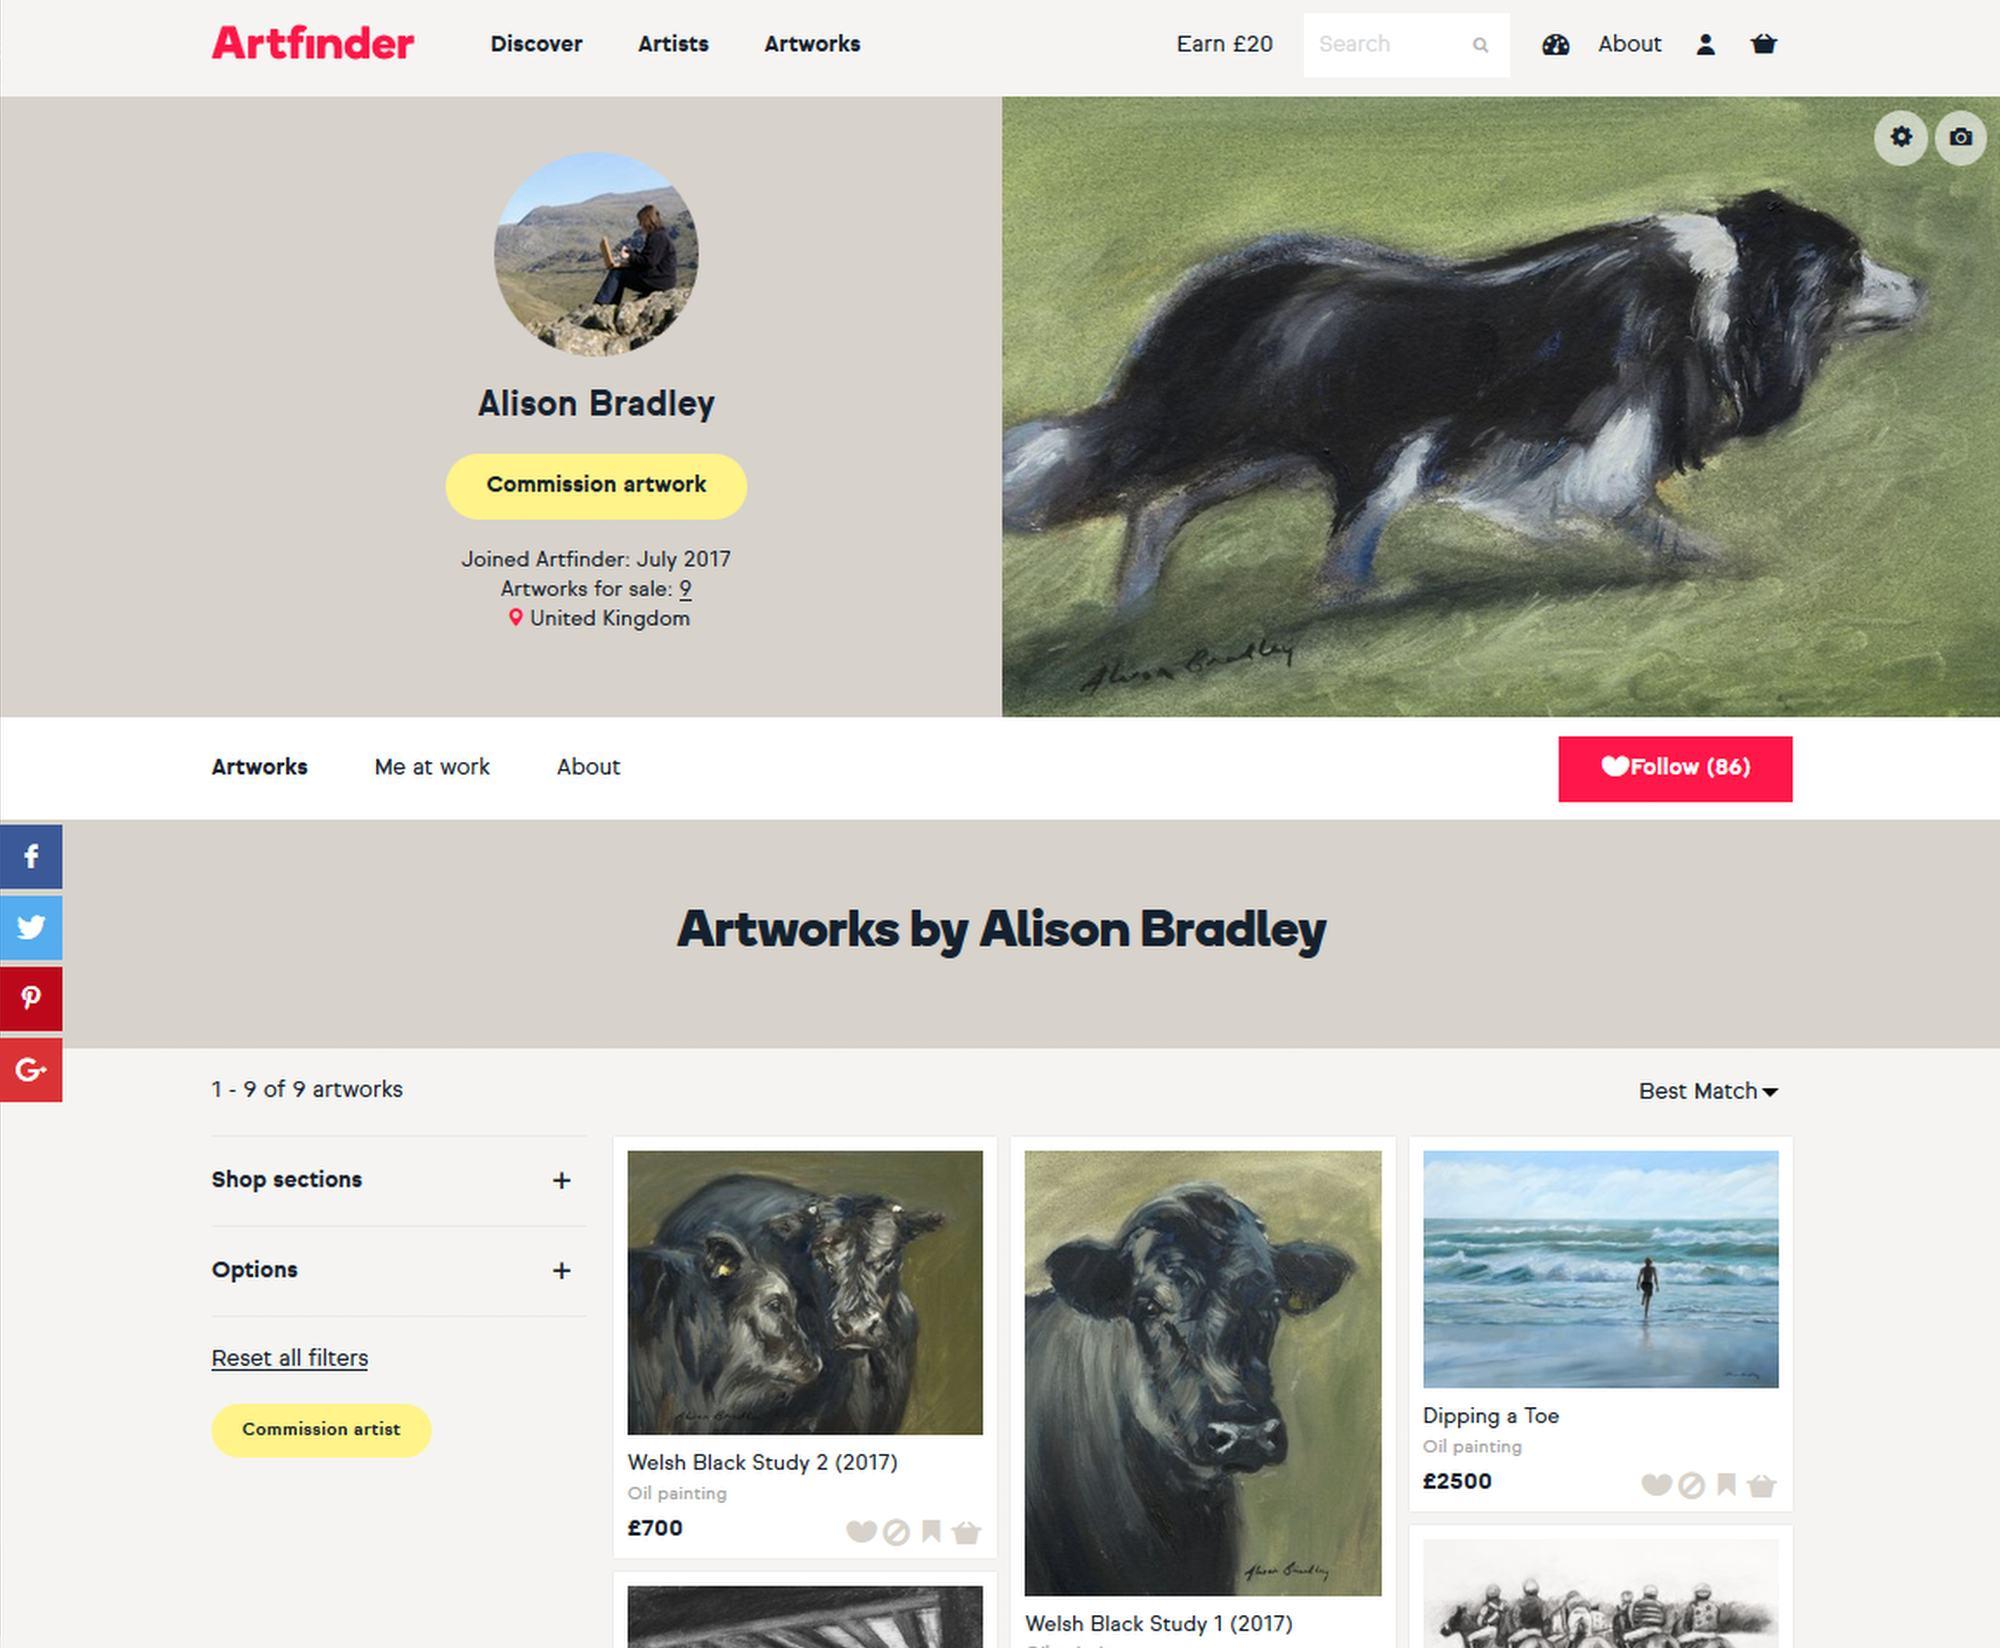 Artfinder - Alison's page